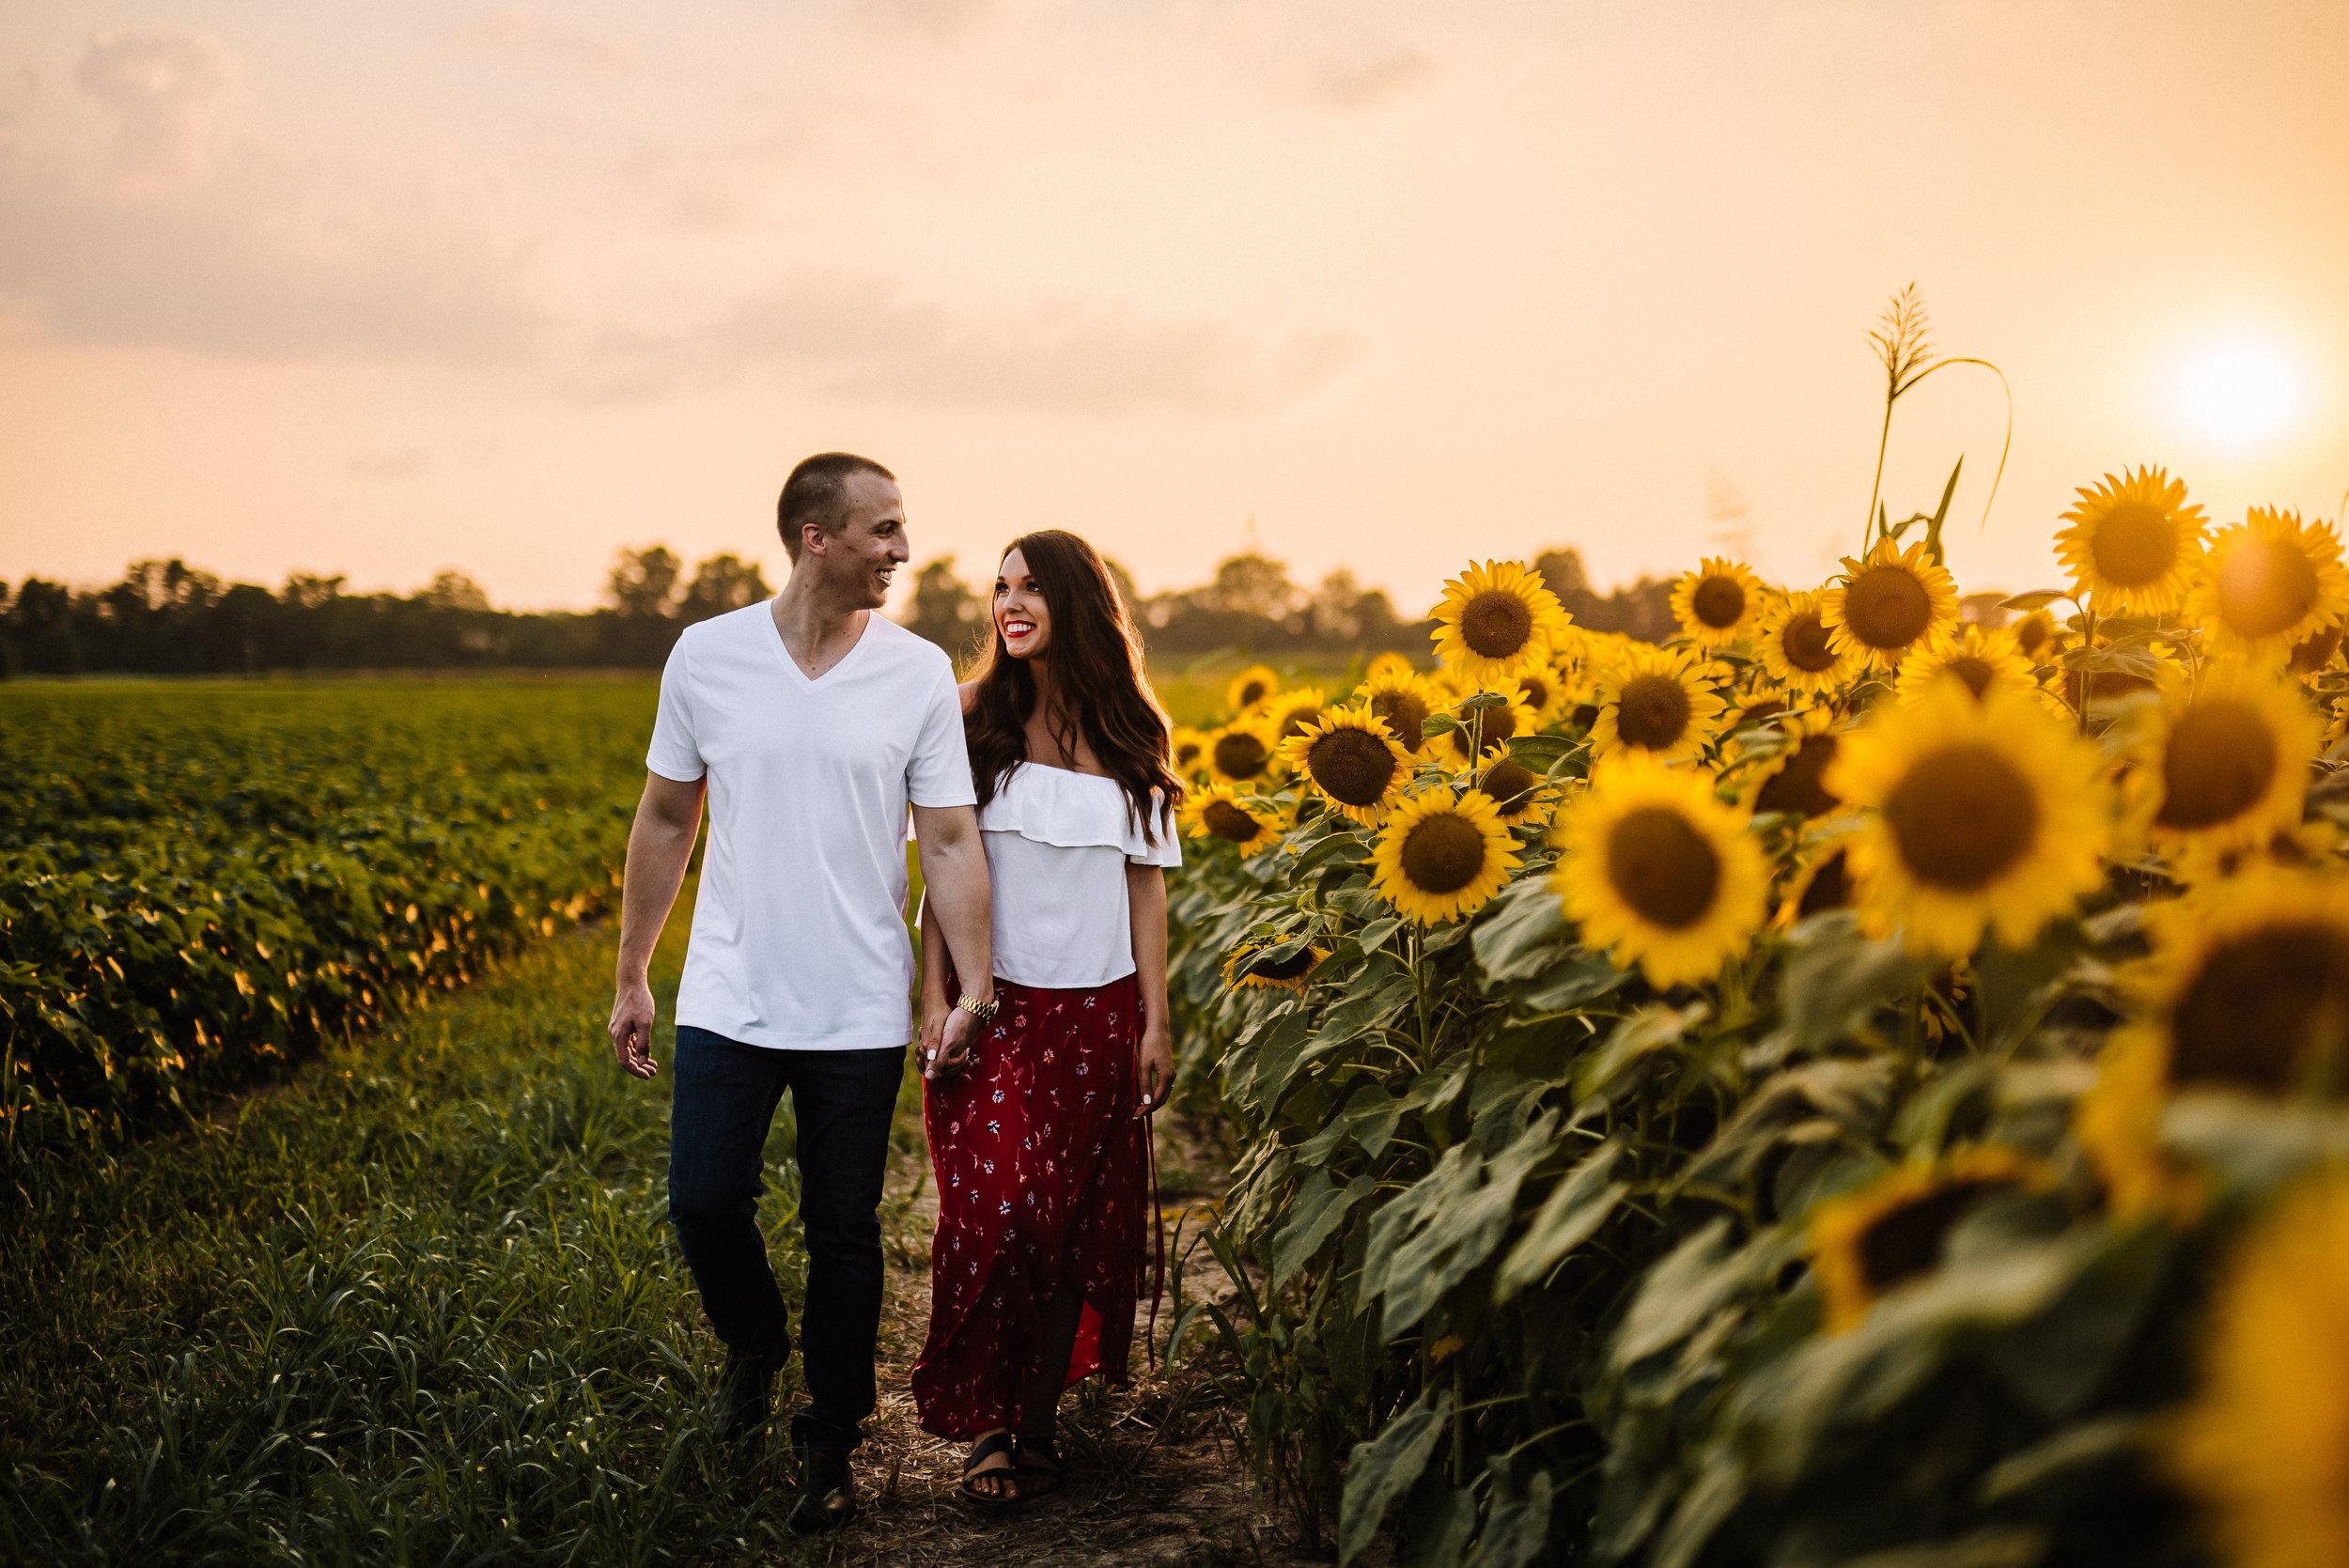 Kaitlynne&Van_Sunflowers_Ashley-Benham-Photography-28.jpg